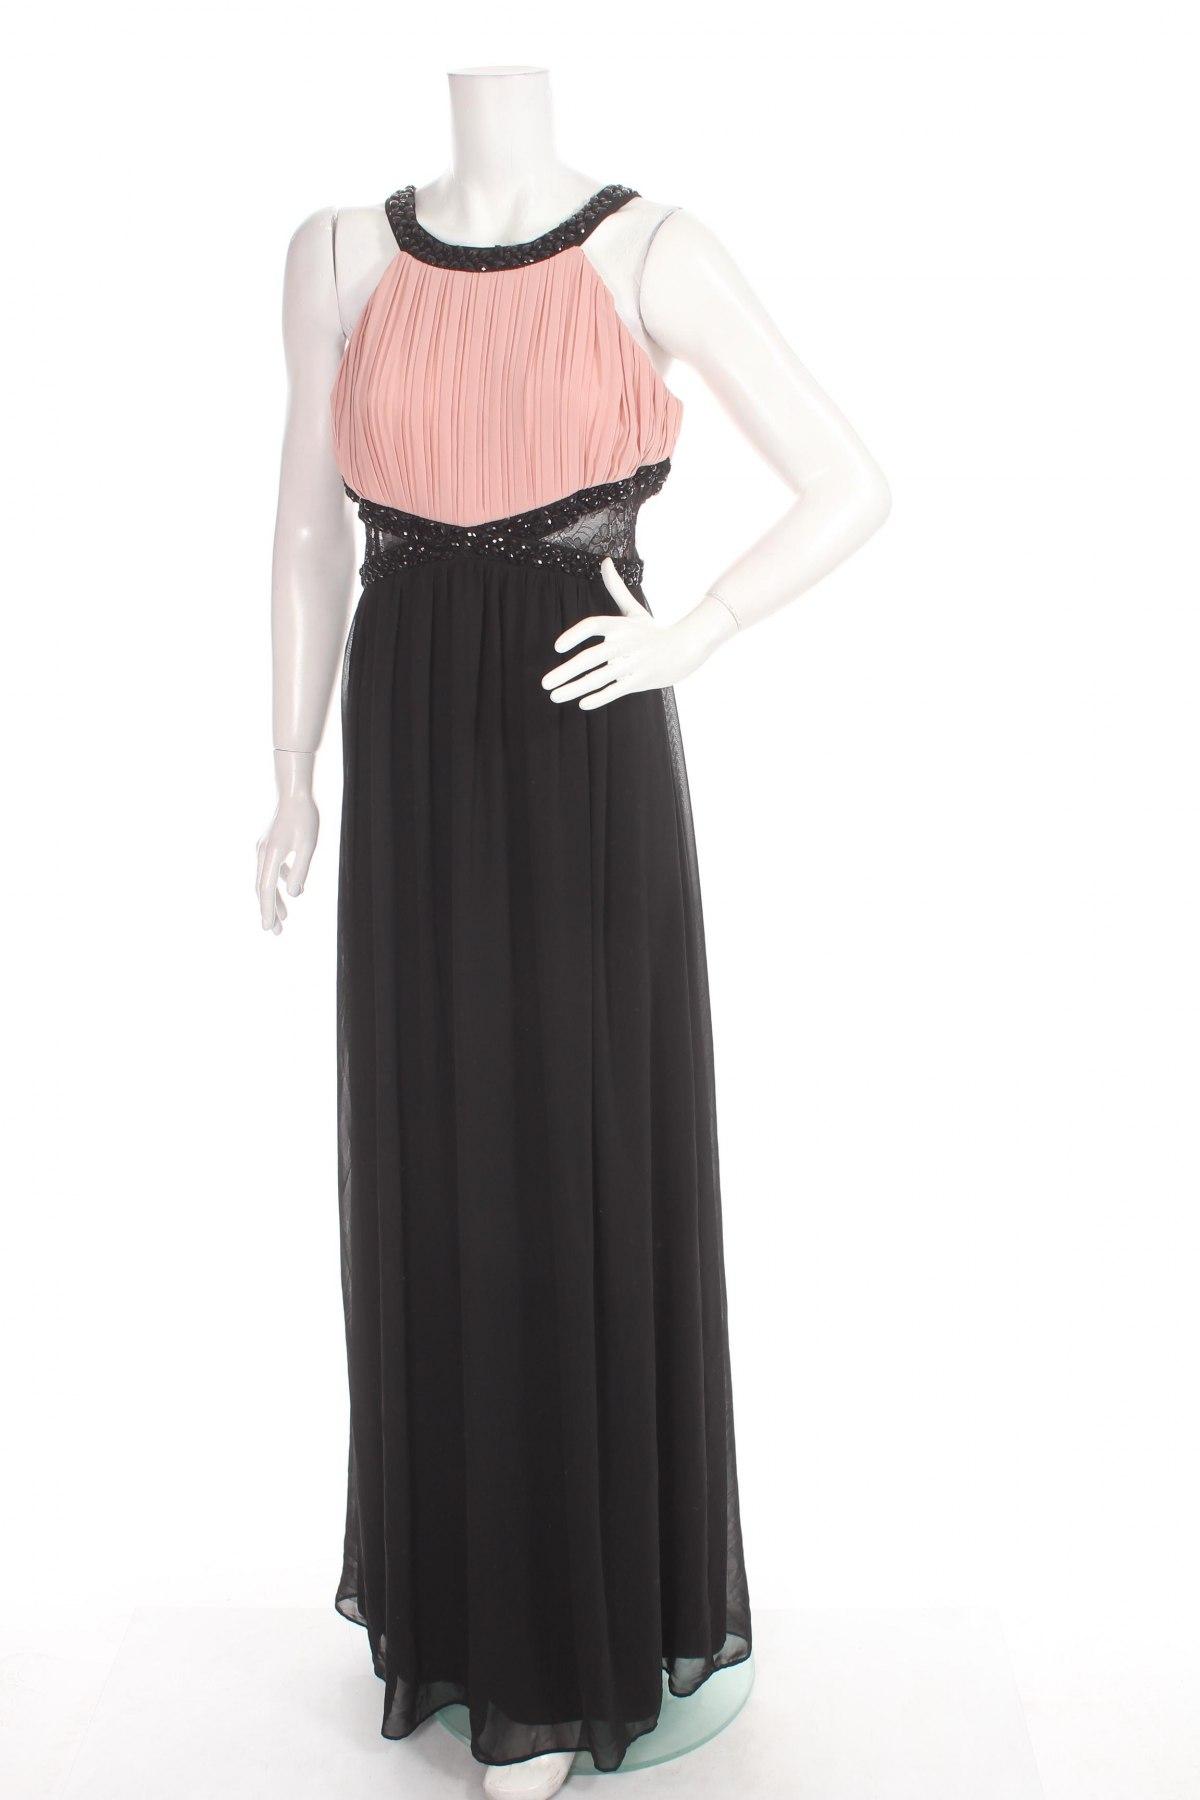 d88b2364fc9e Φόρεμα Jake s - σε συμφέρουσα τιμή στο Remix -  104728559